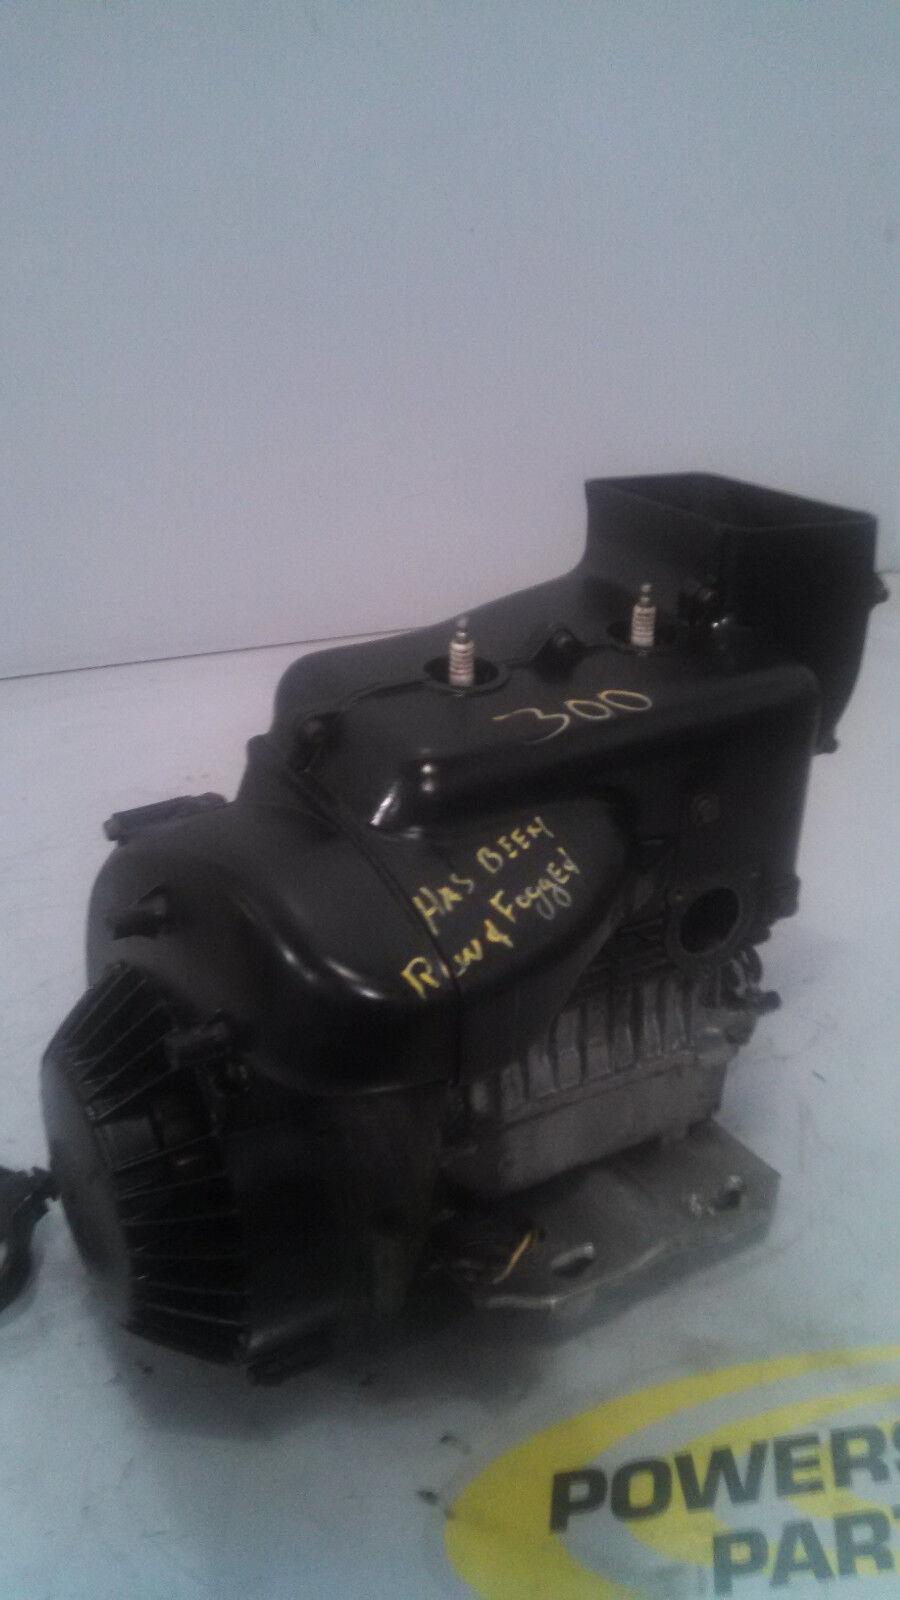 78 79 80 81 82 83 Yamaha Enticer Inviter 300 294 Engine Motor Exciter Crankcase